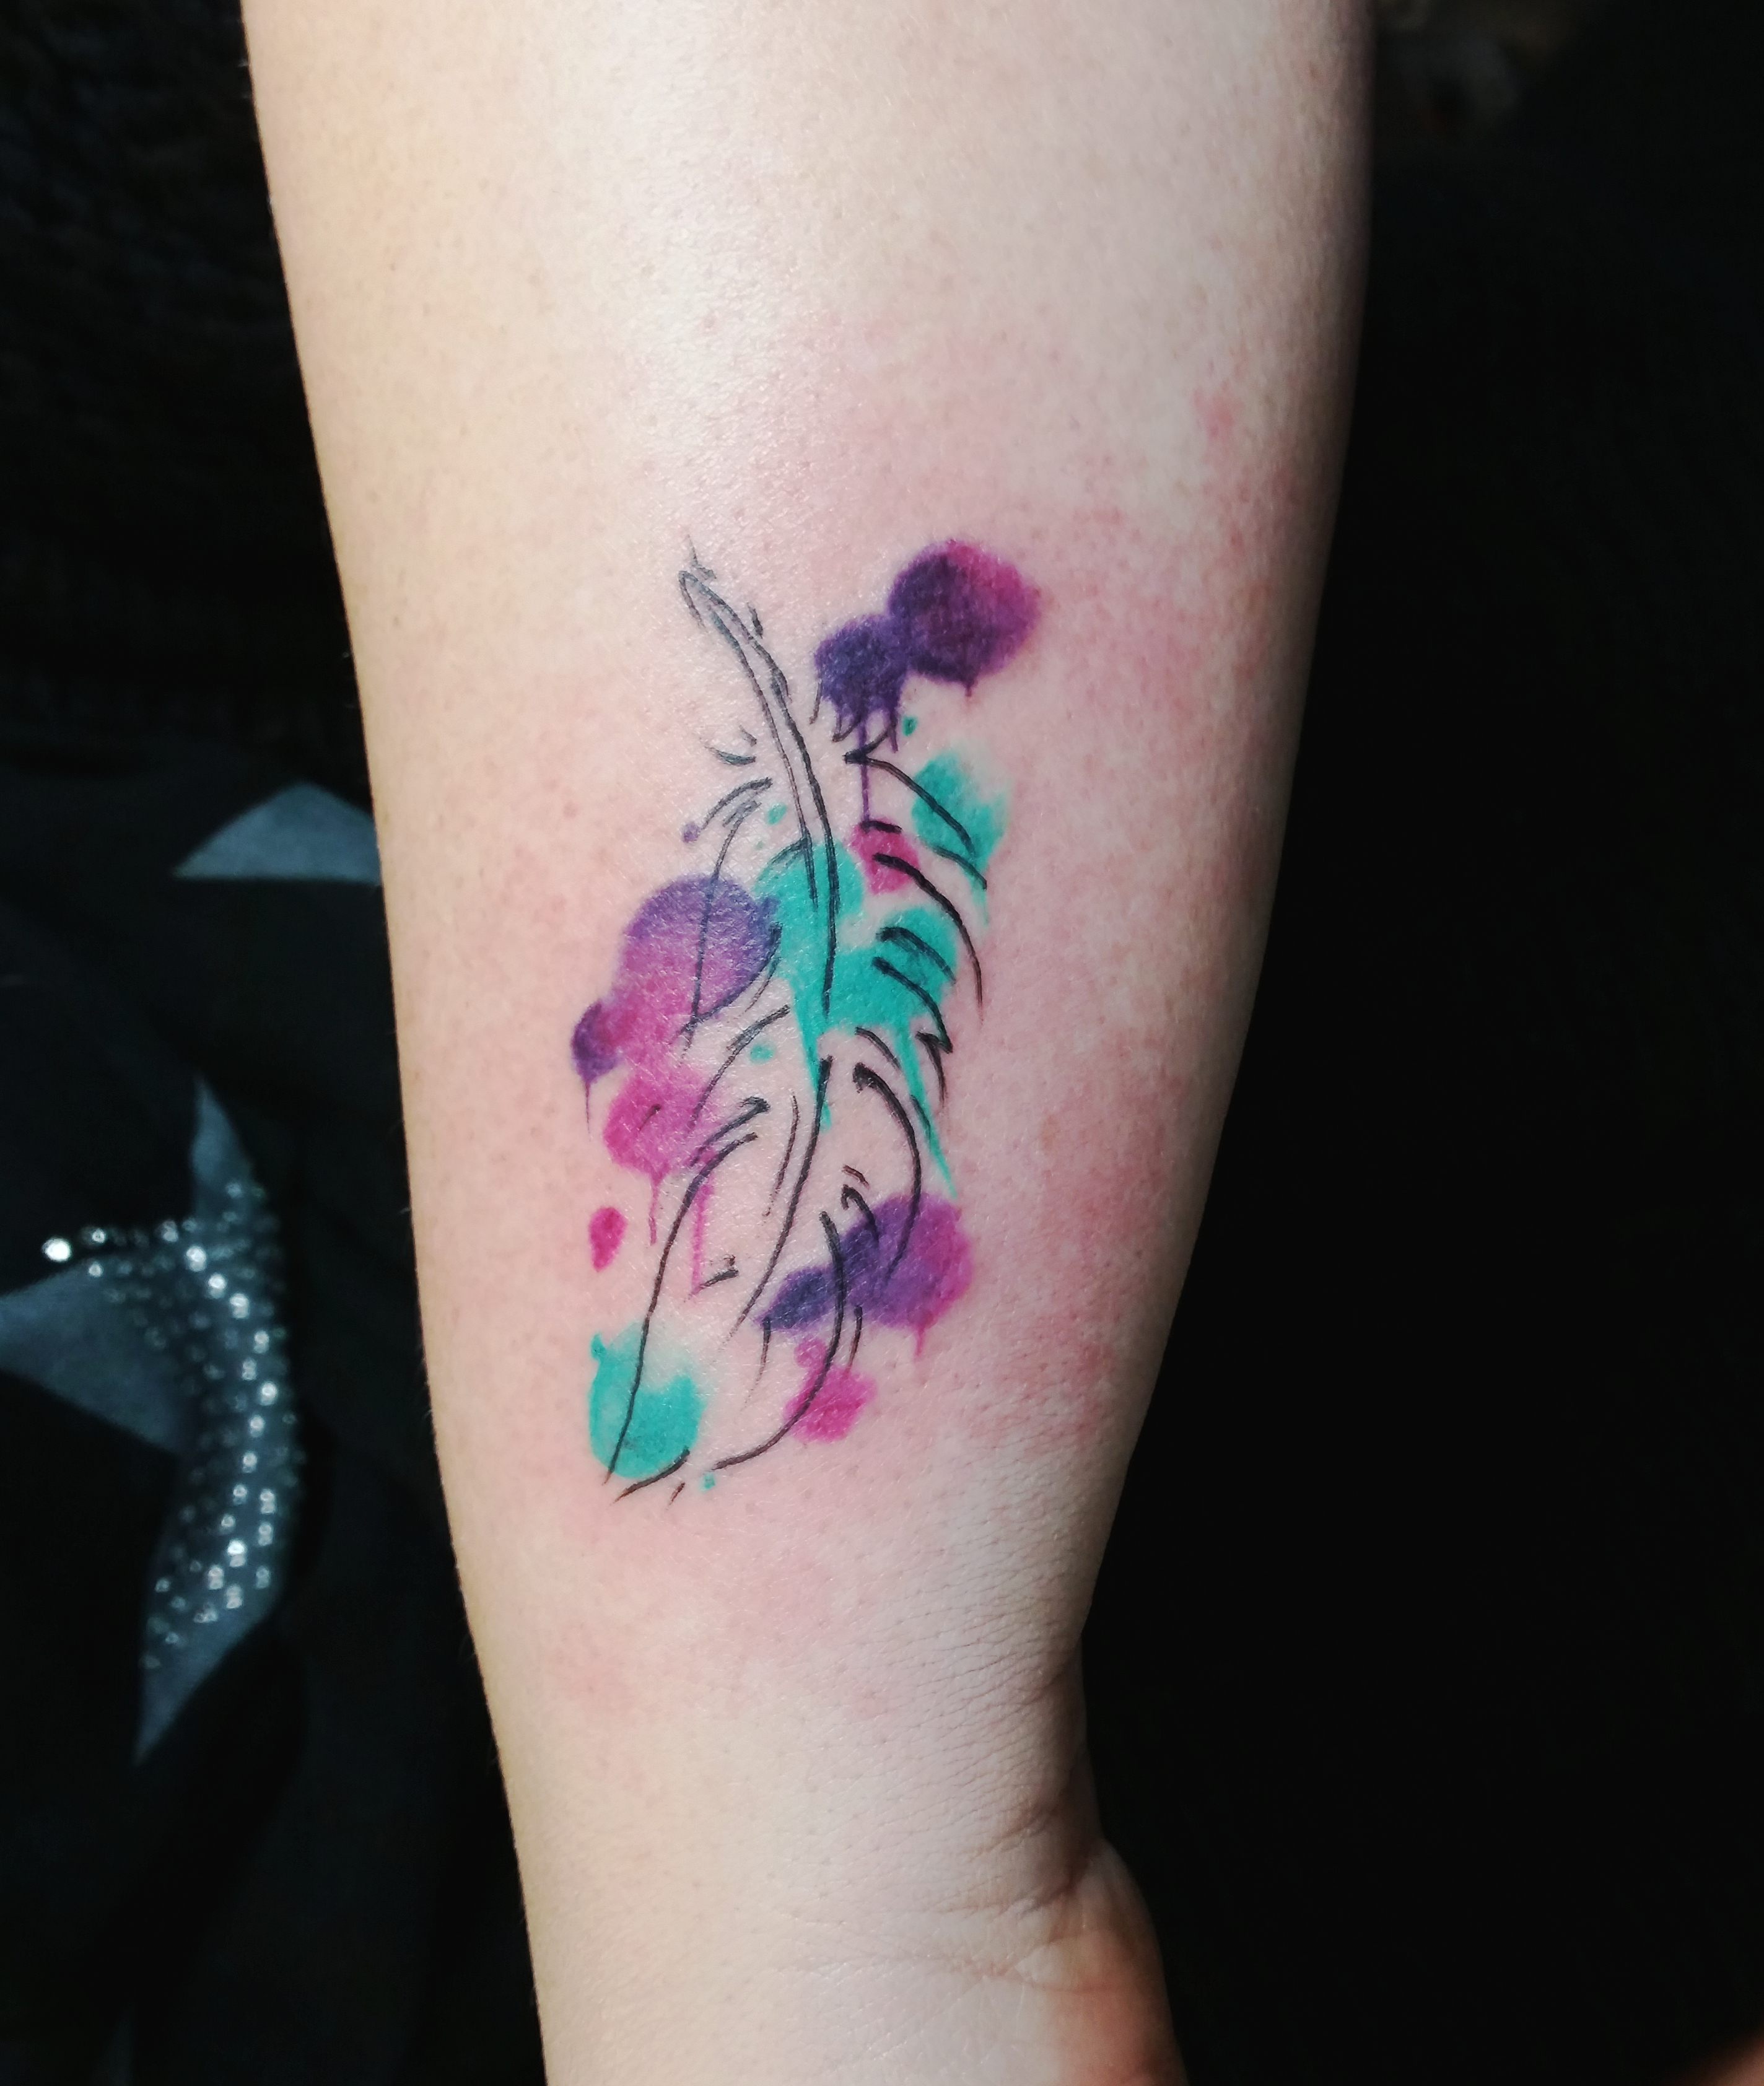 federtattoo aquarell tattoo watercolor tattoos. Black Bedroom Furniture Sets. Home Design Ideas